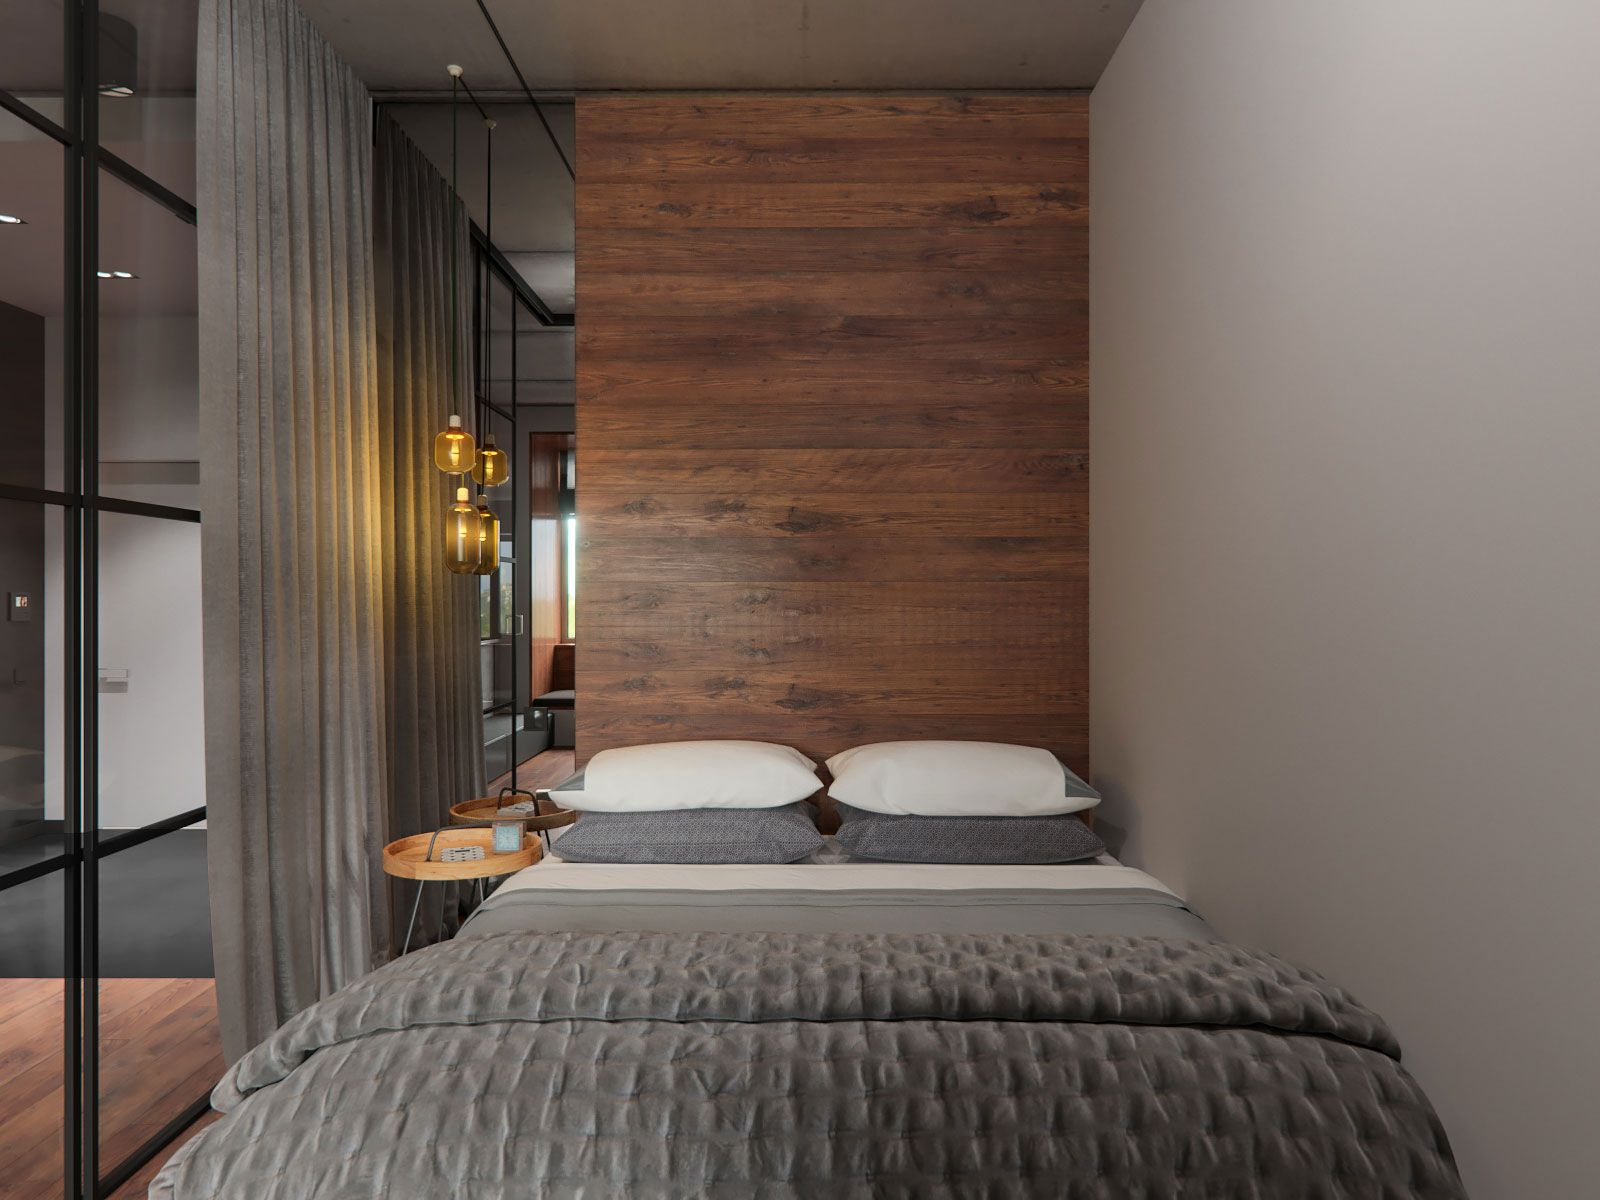 Mooseberry design group creates a contemporary interior in odessa ukraine